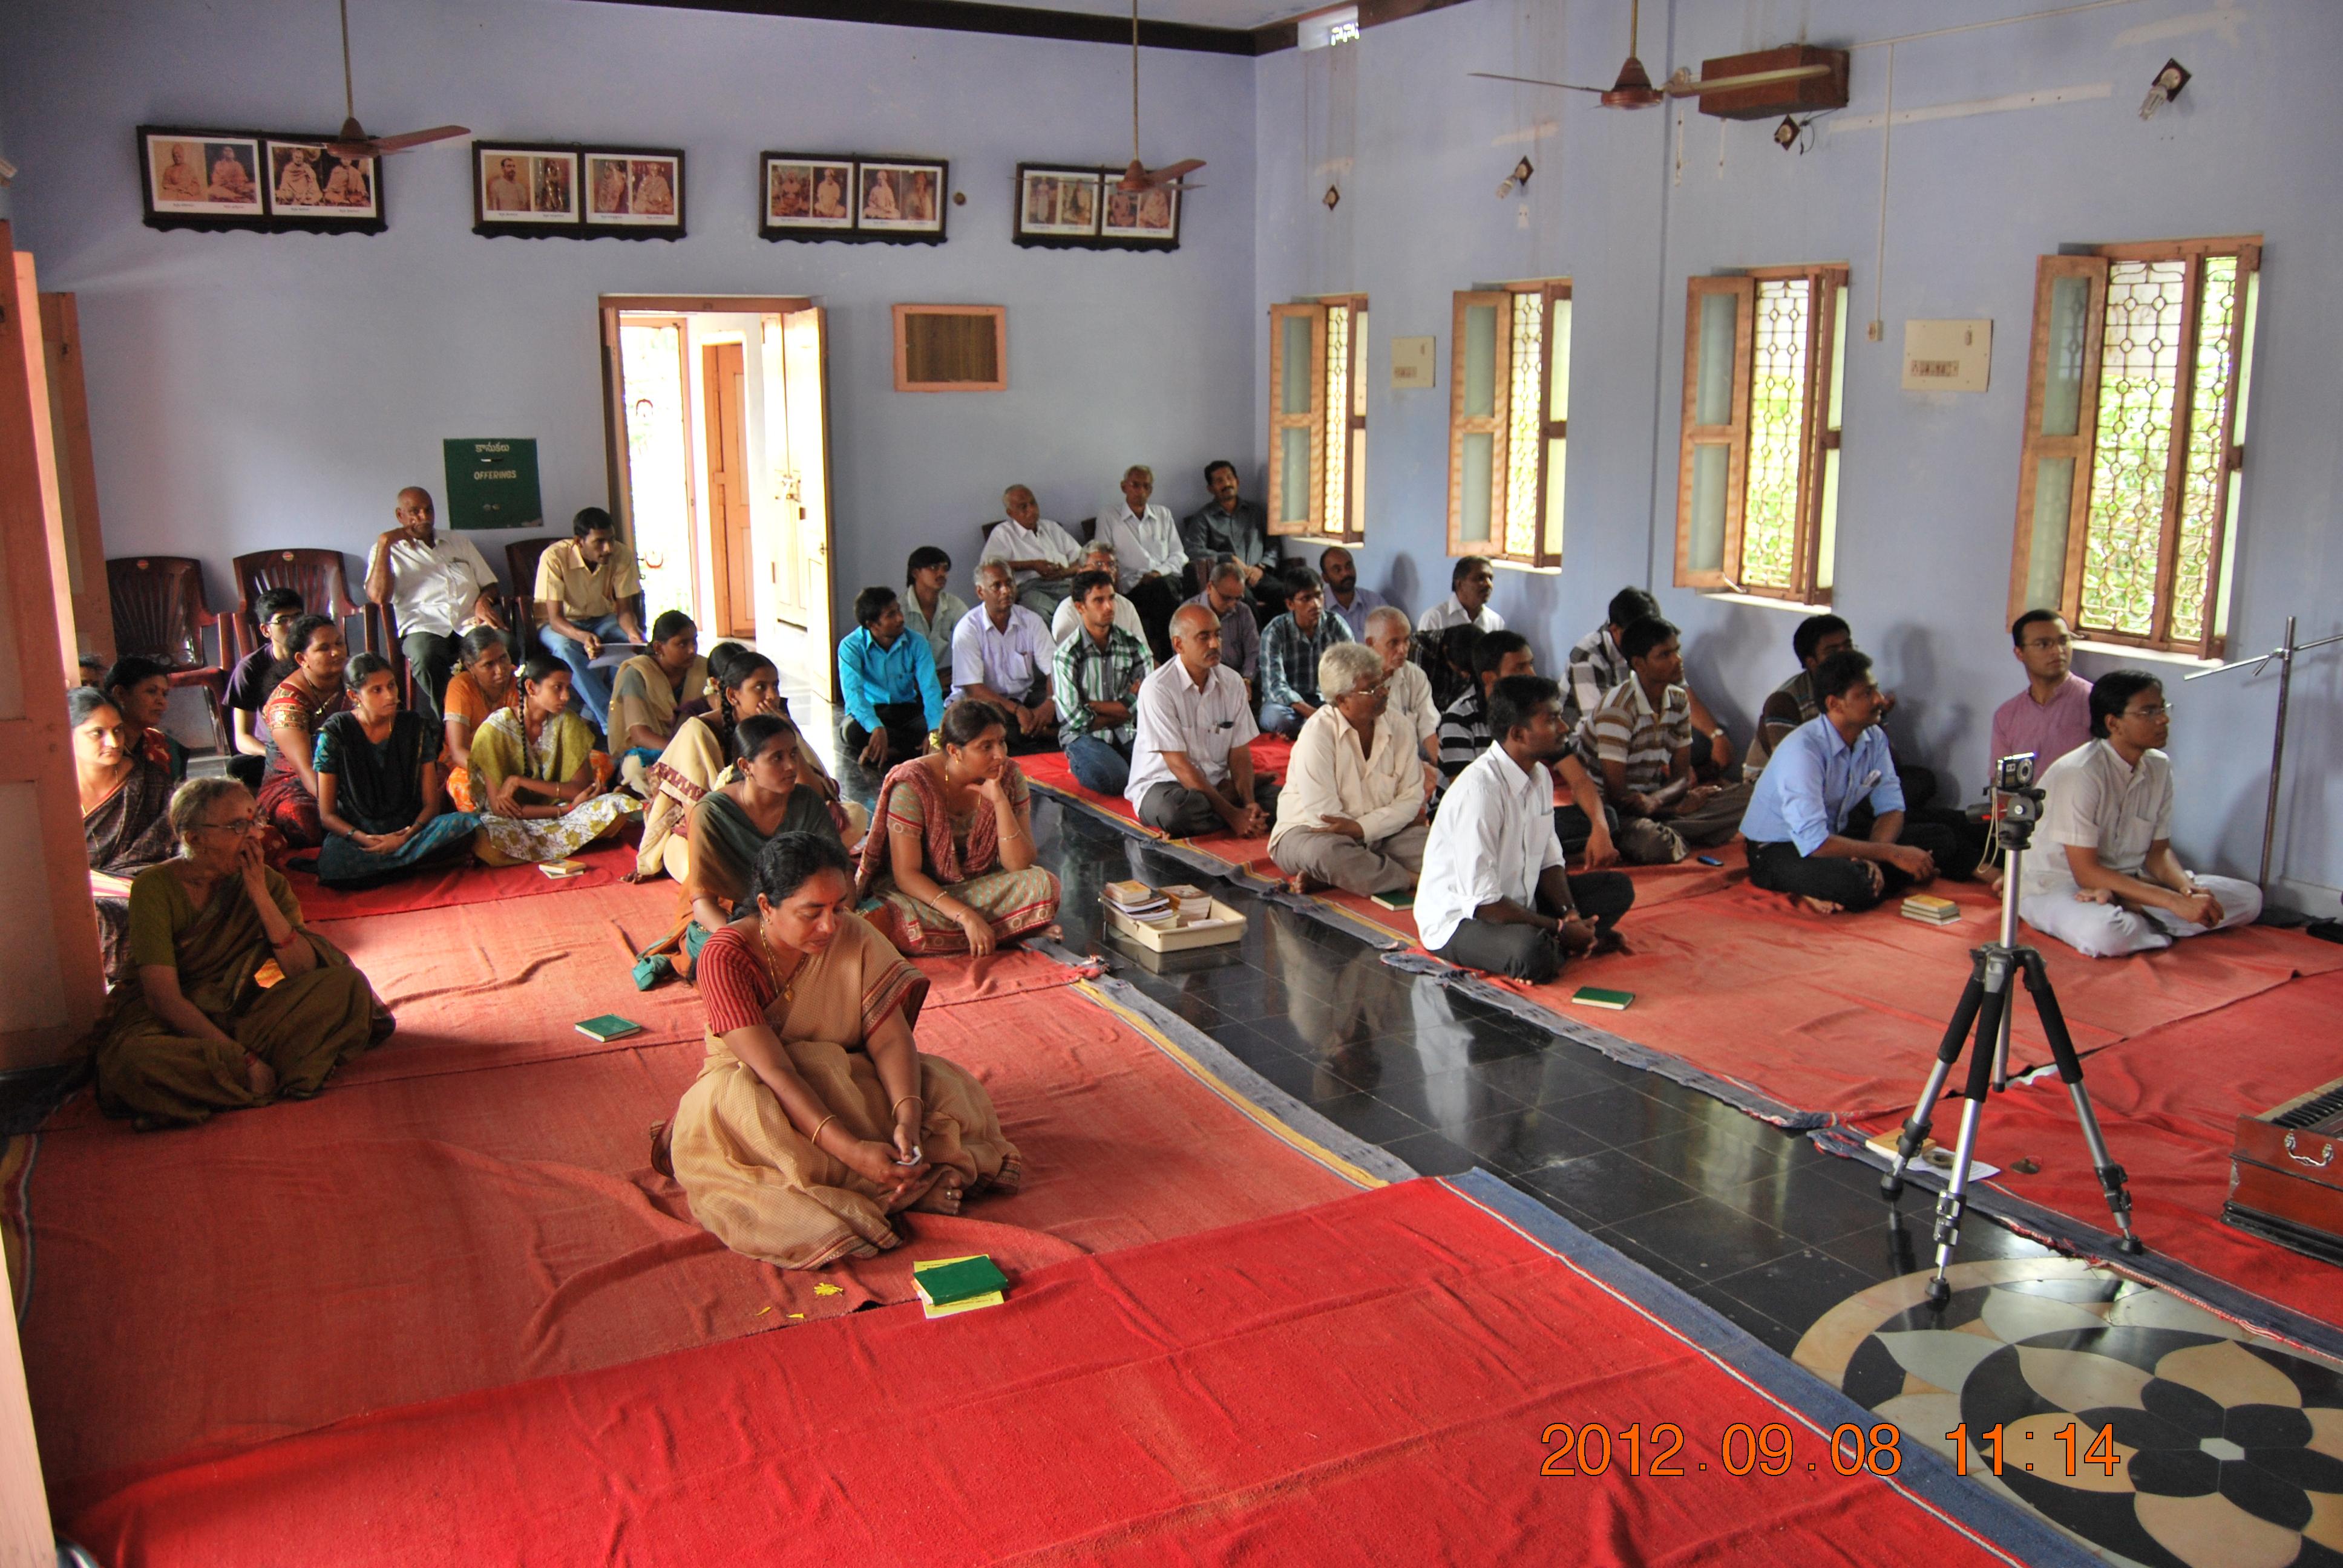 Gathering of devotees 8 Sep 2012